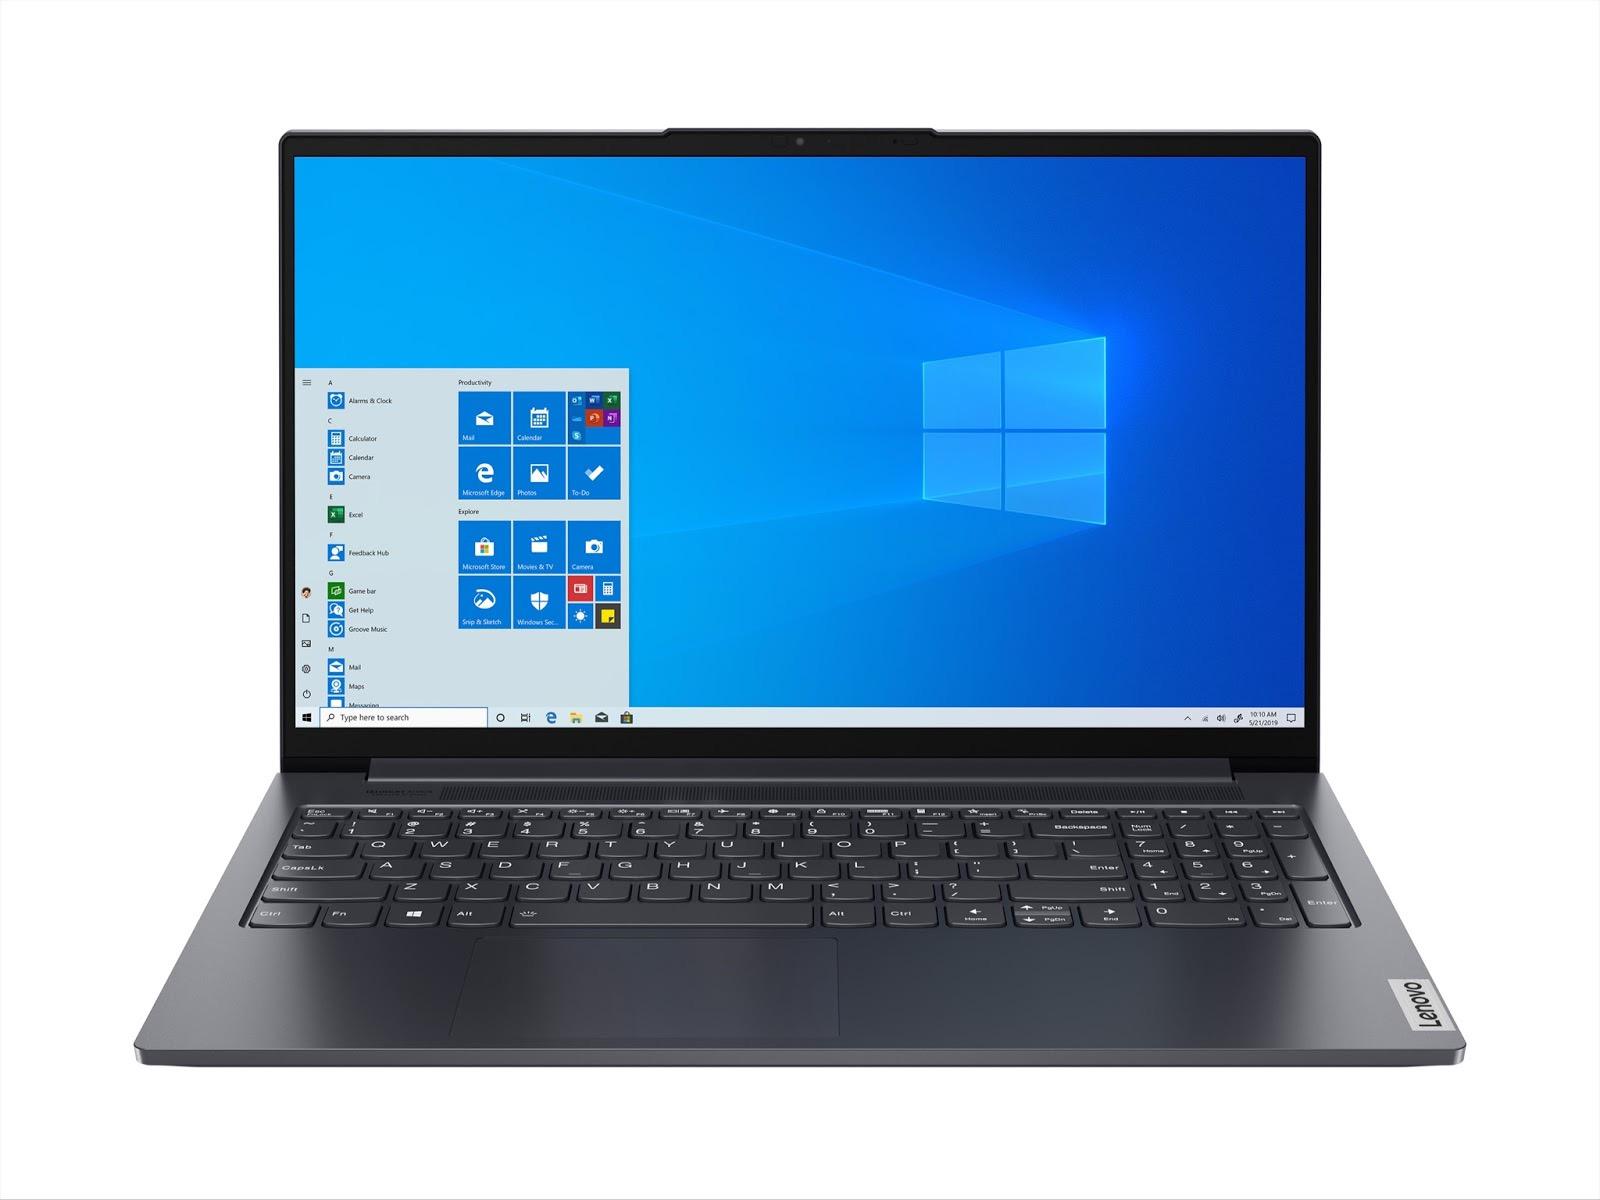 Фото 1. Ноутбук Lenovo YOGA Slim 7i 15IIL05 Slate Grey (82AA0032RE)